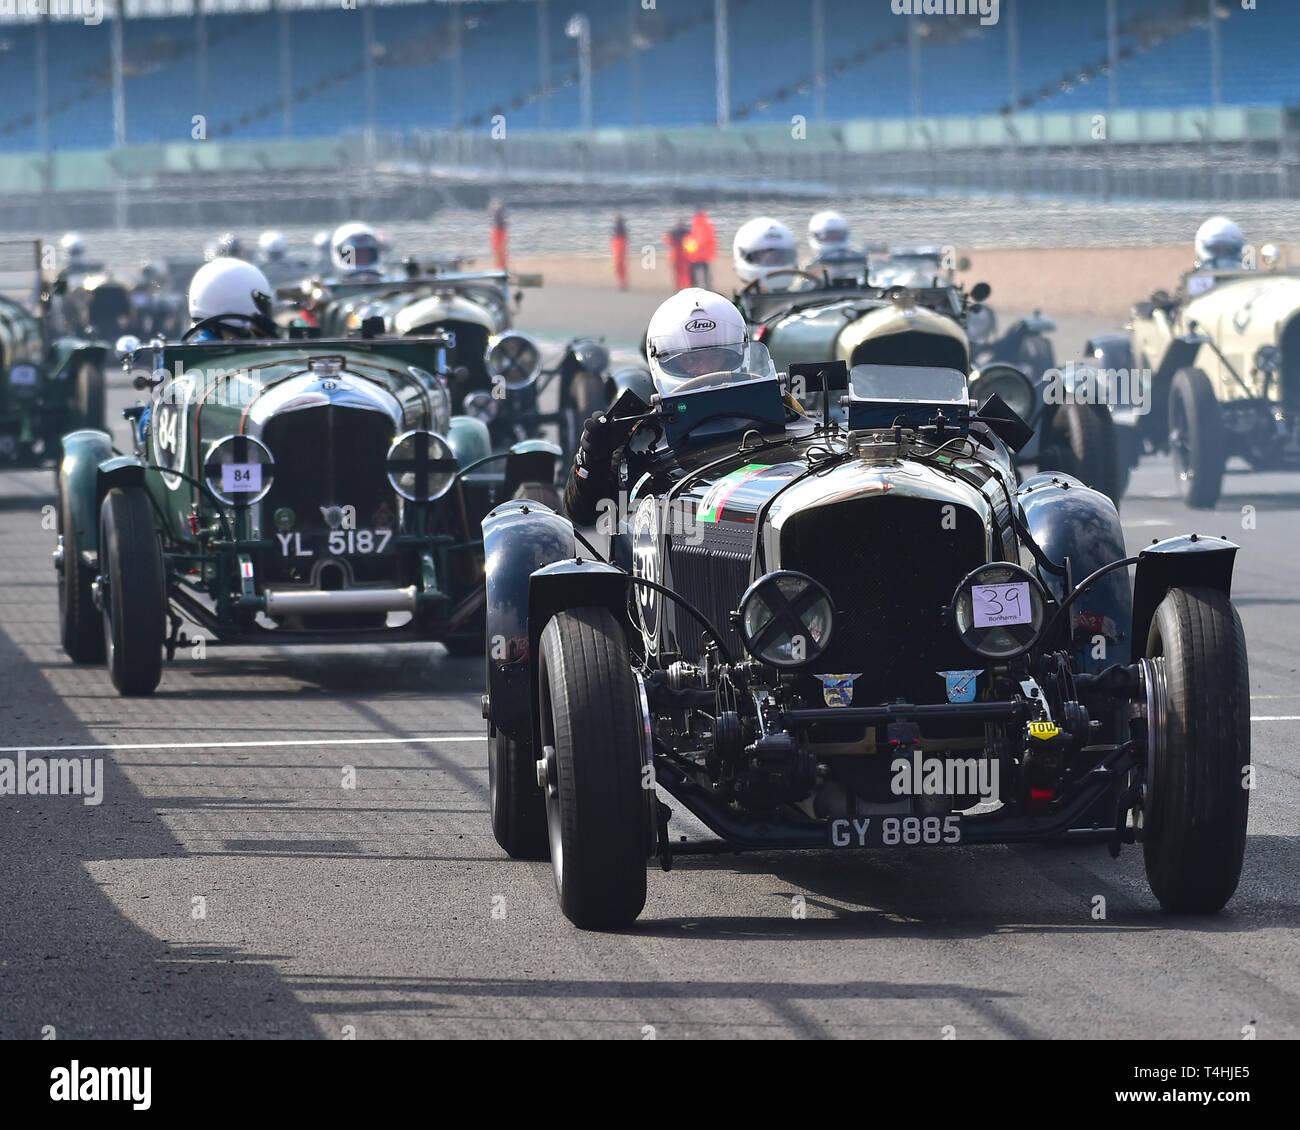 David Ayre, Bentley 4 ½ litre, Benjafield 100, 100 Years of Bentley, April 2019,  Silverstone, Northamptonshire, England, circuit racing, classic cars - Stock Image